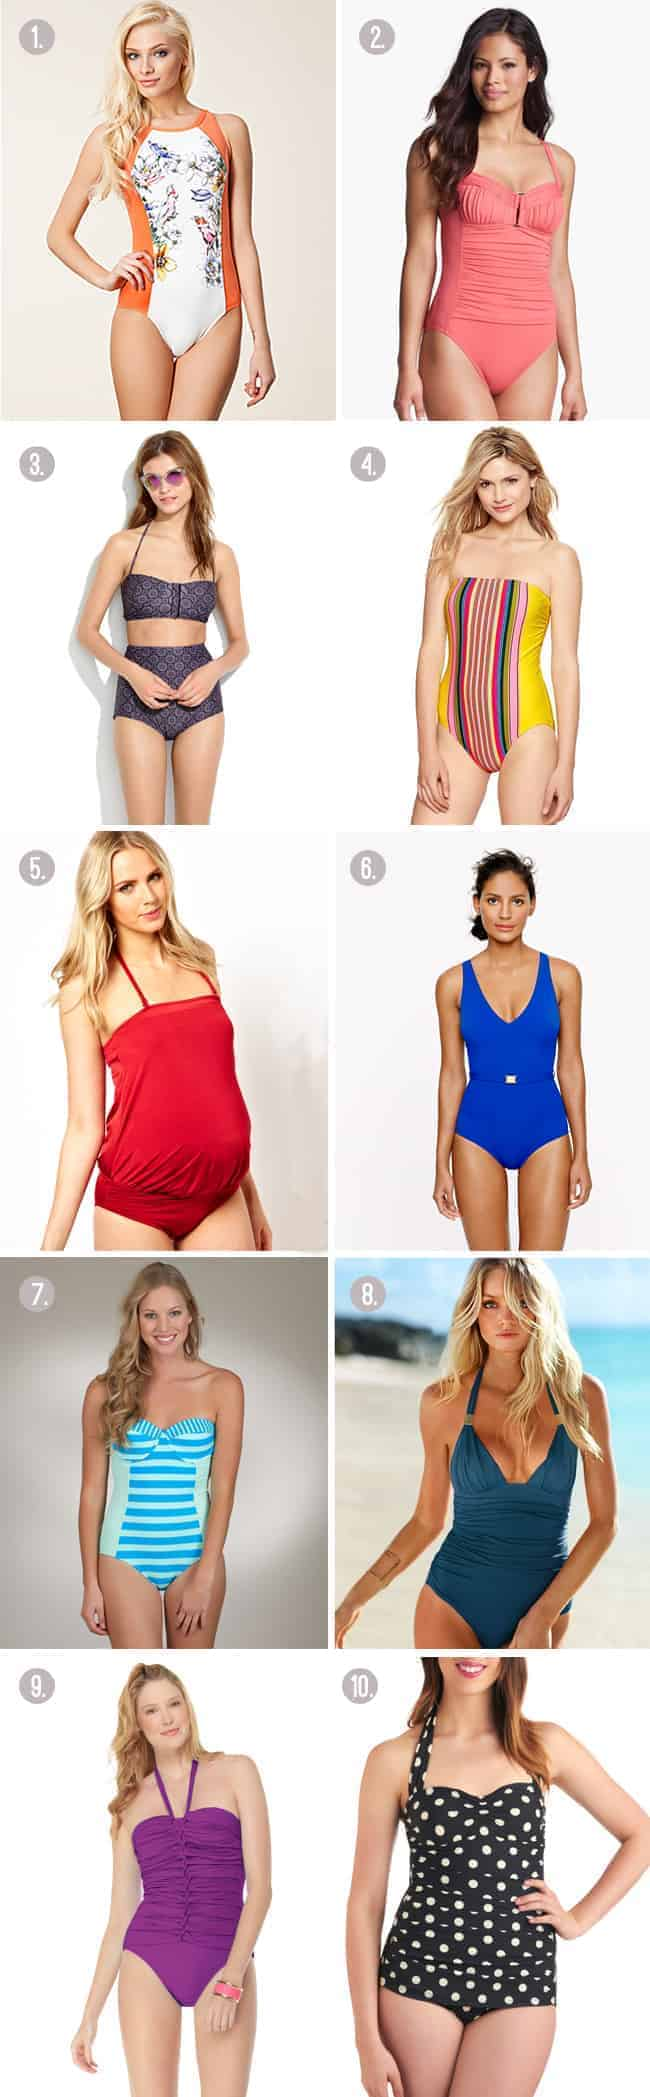 10 mom friendly swimsuits | Hello Glow